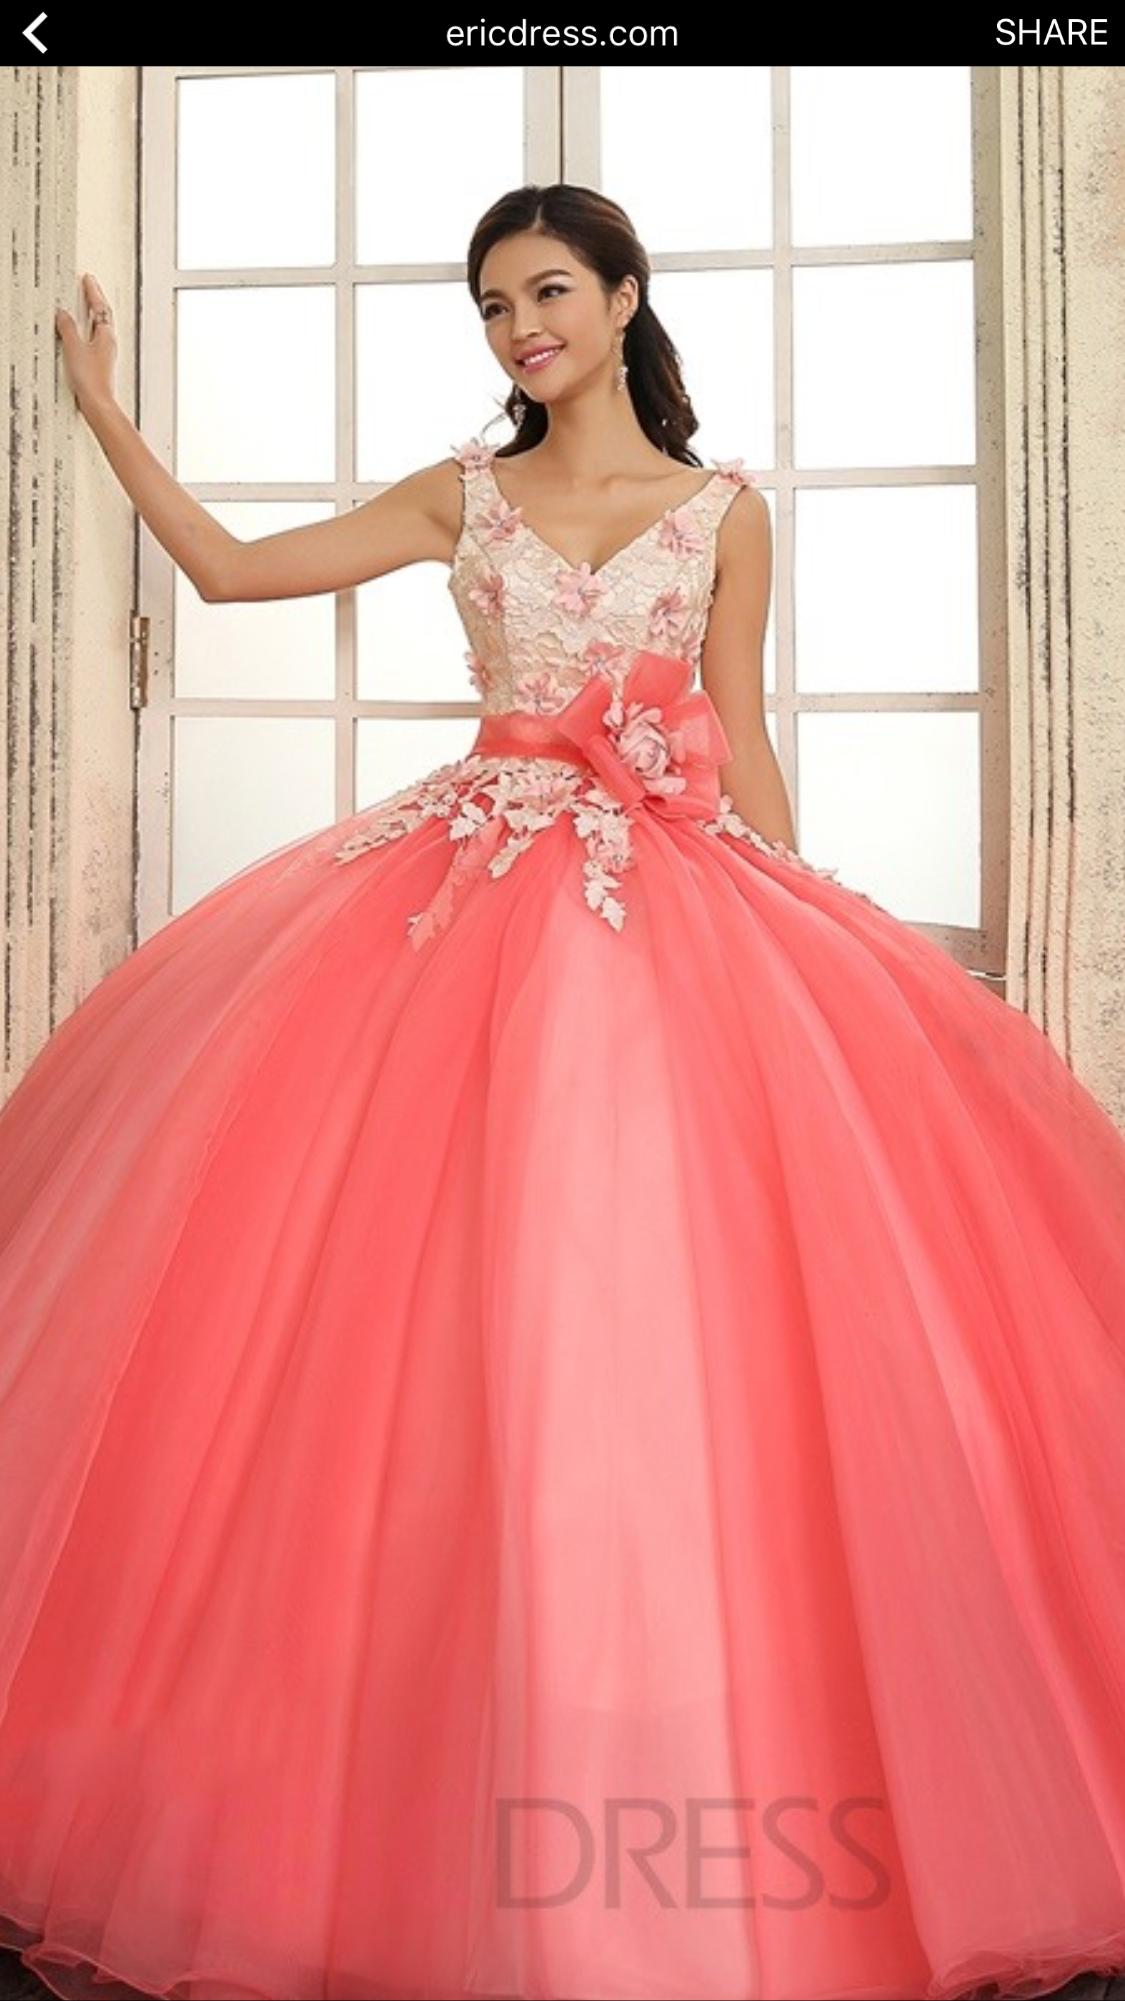 Pin de Jade Morrow en Prom Dresses | Pinterest | Vestidos de boda de ...